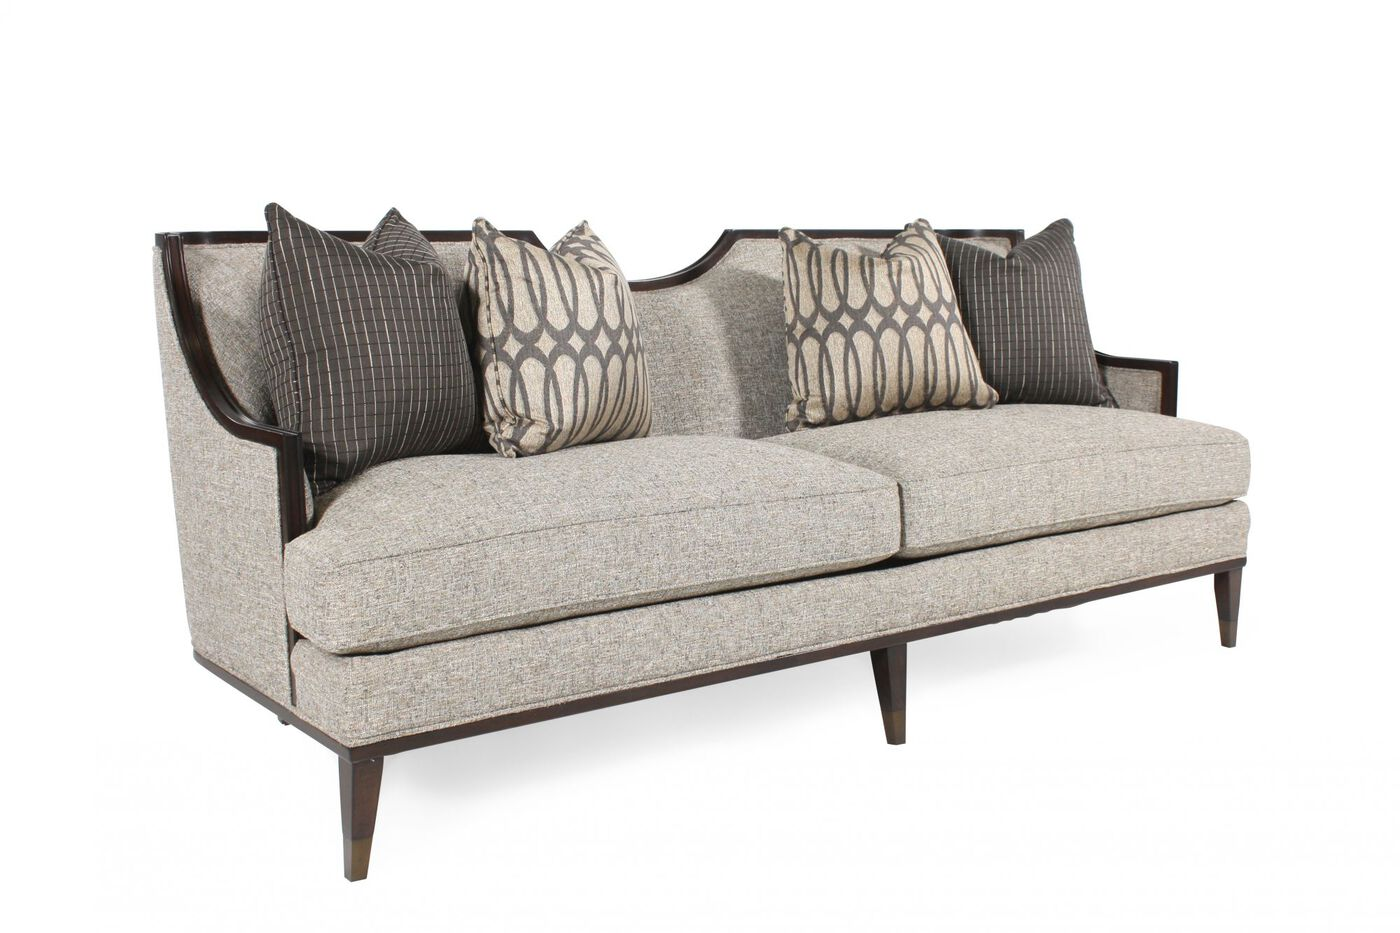 Art Sofa Stephanie Toppin S Crocheted Fungus Couch Art I